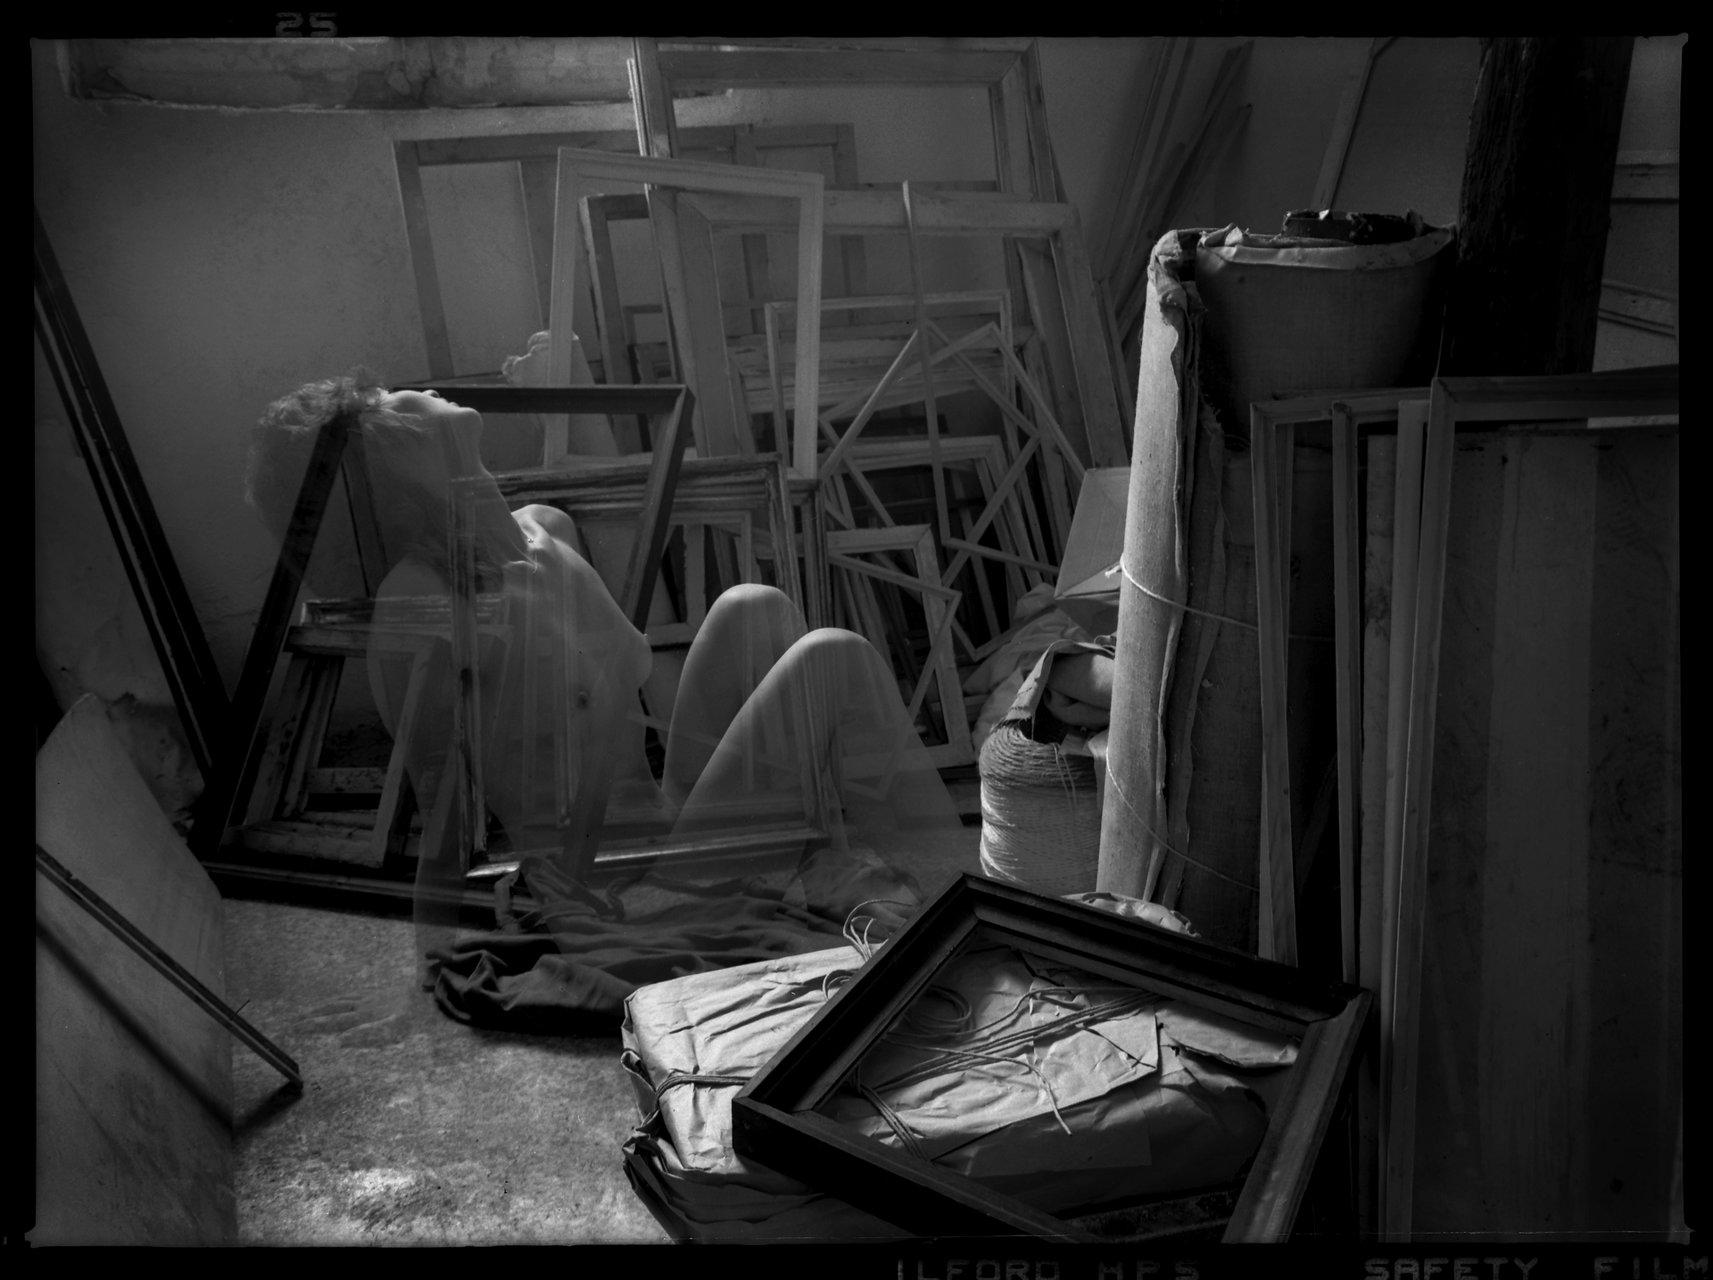 стая  за  рамки | Author IVO BOBEV - IKB | PHOTO FORUM